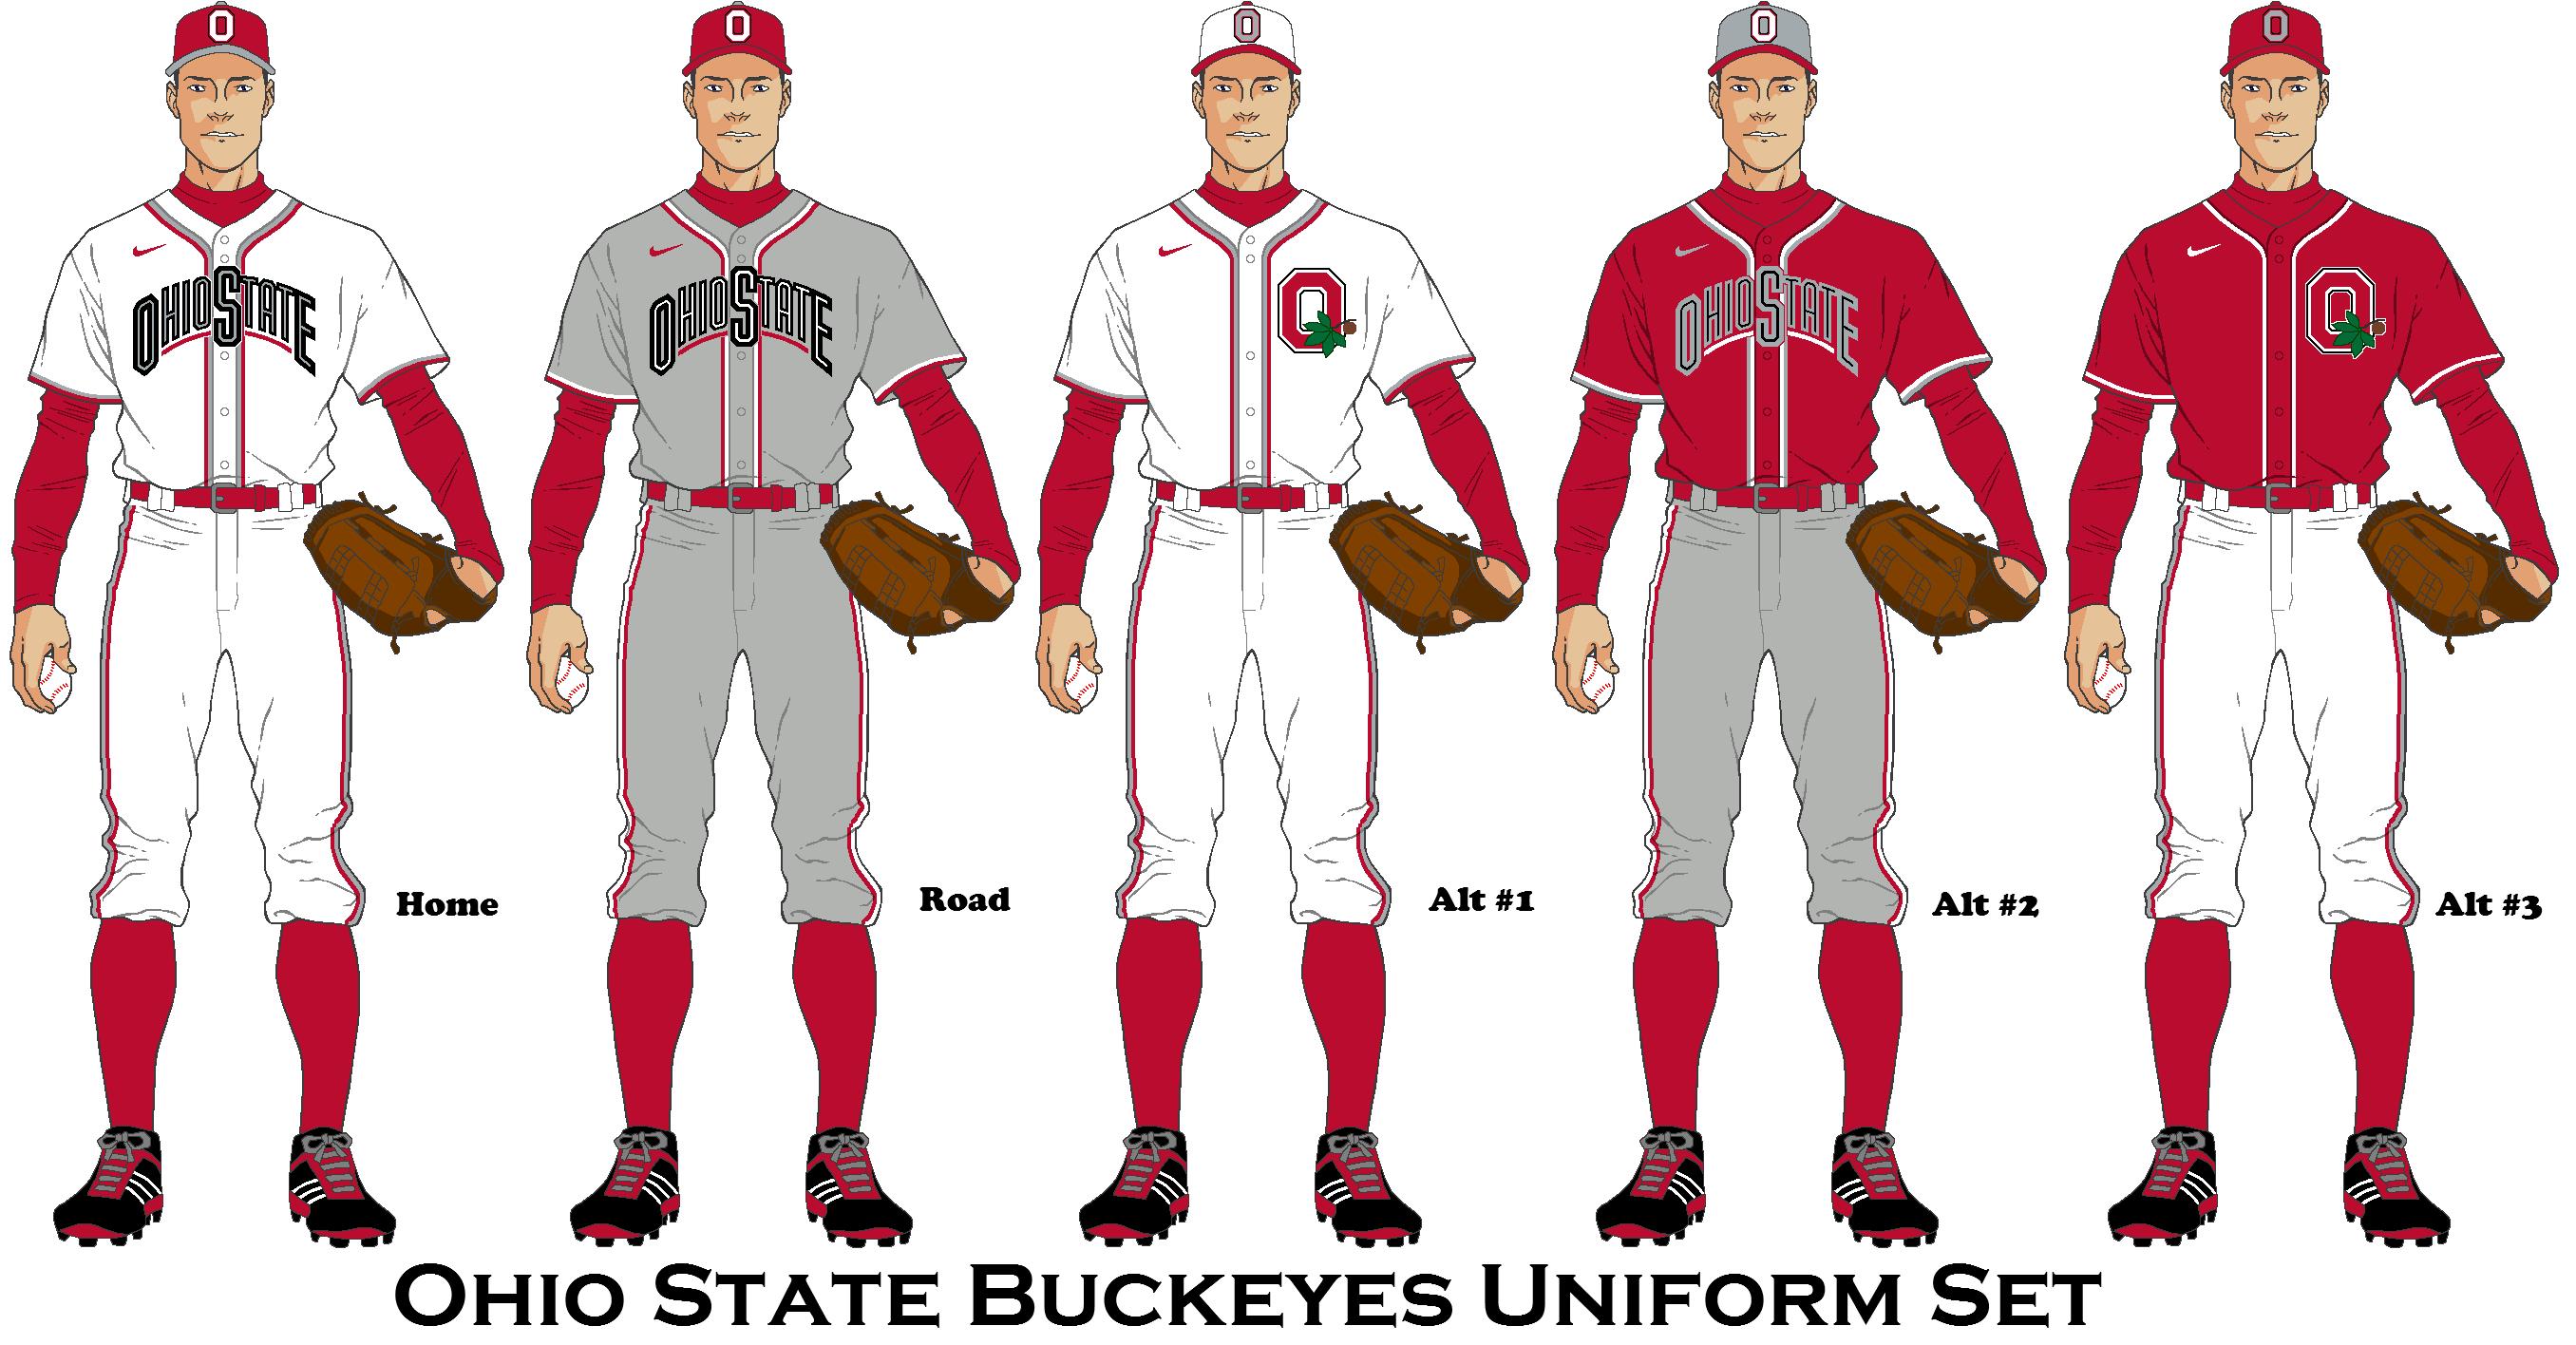 Ohio State Buckeyes Baseball Uniform Concept Bearcats Baseball Cincinnati Bearcats Baseball Uniform